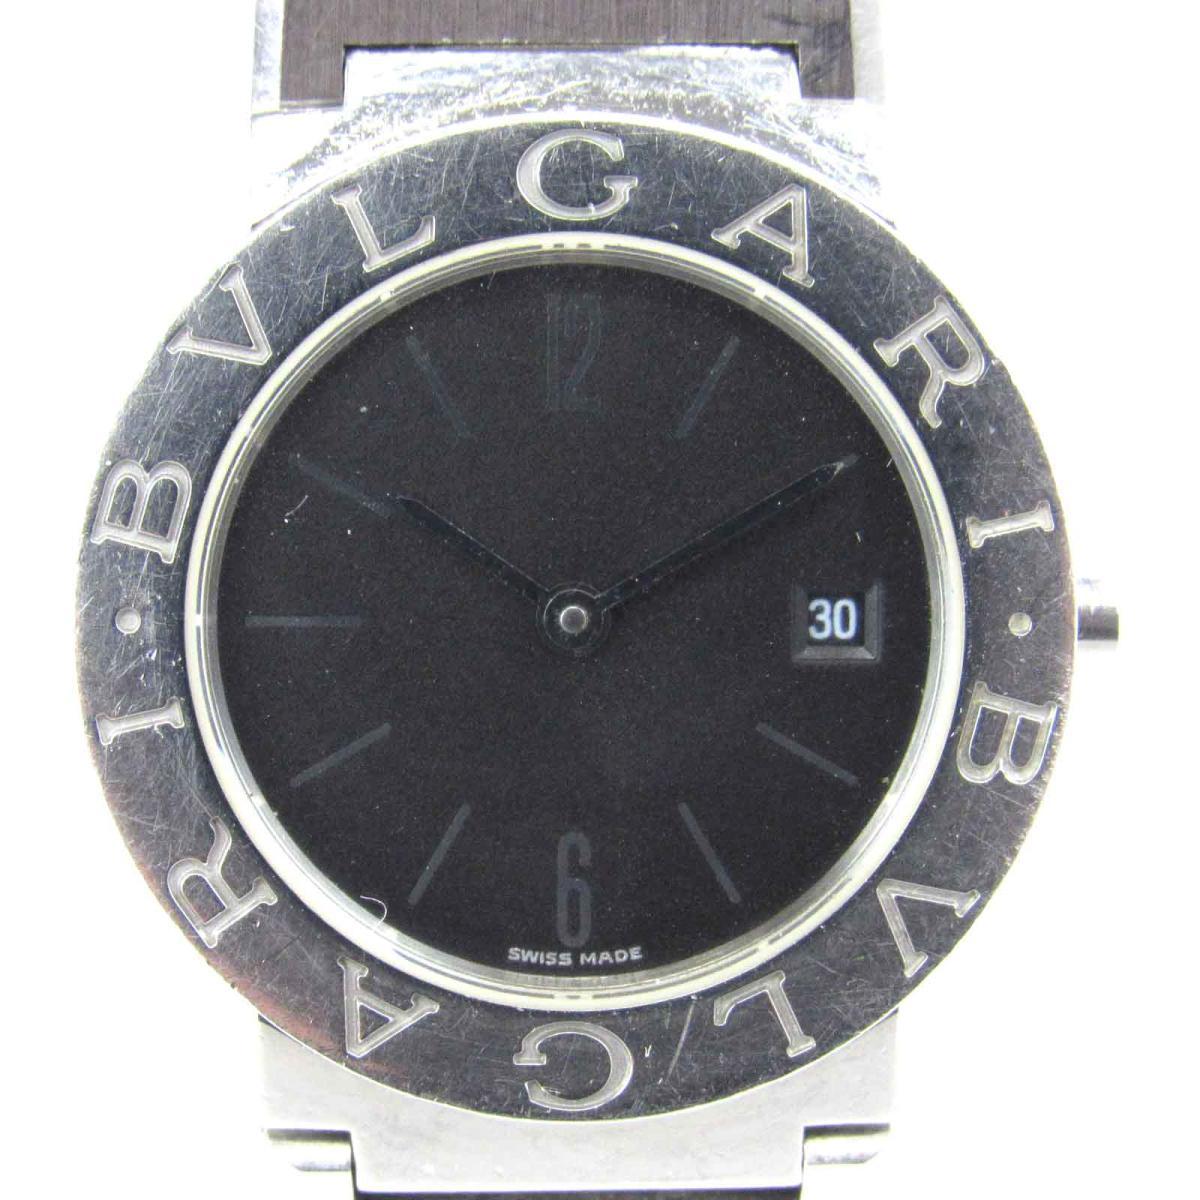 super popular 9374c 212eb BVLGARI 時計 BB26SS ブルガリ ブルガリ 腕時計 ウォッチ ...